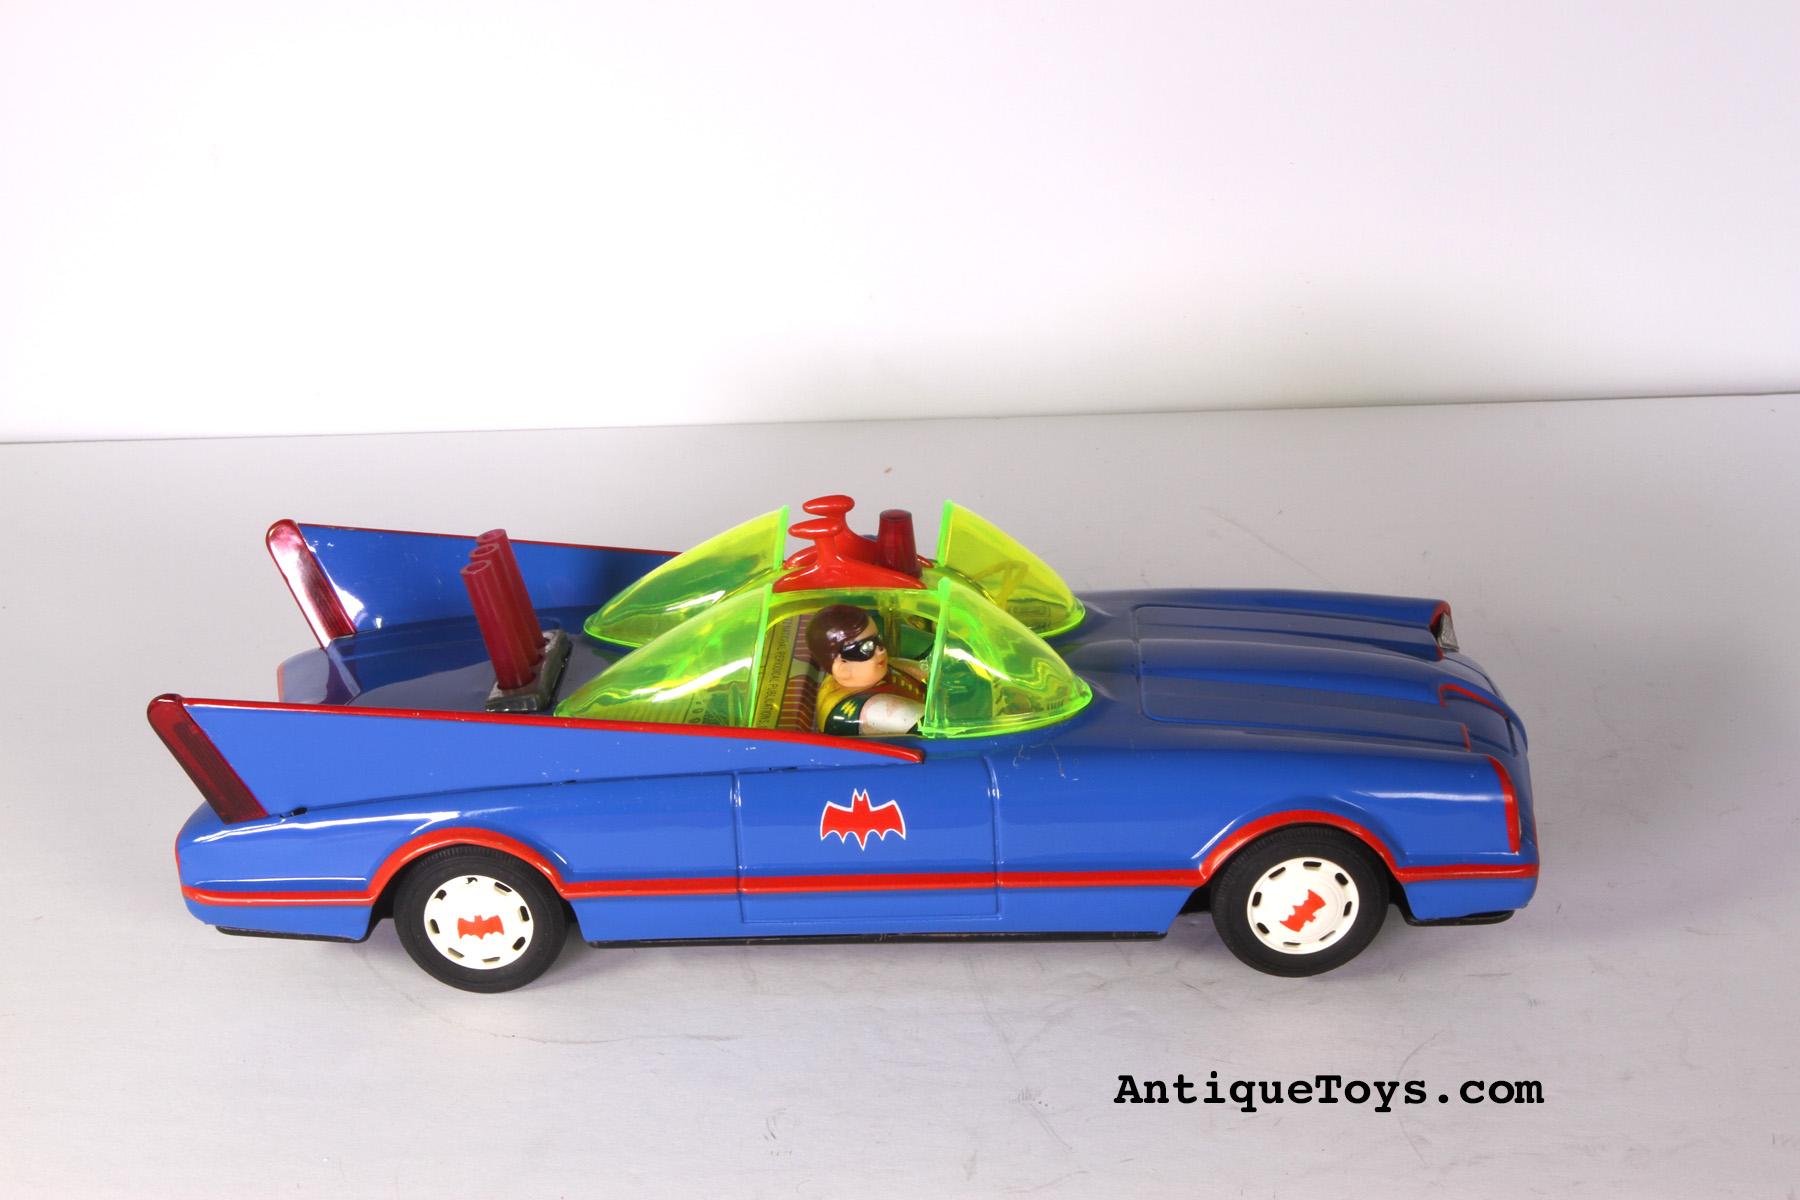 Batmobile Tin Car from Ahi Japan - Antique Toys for Sale